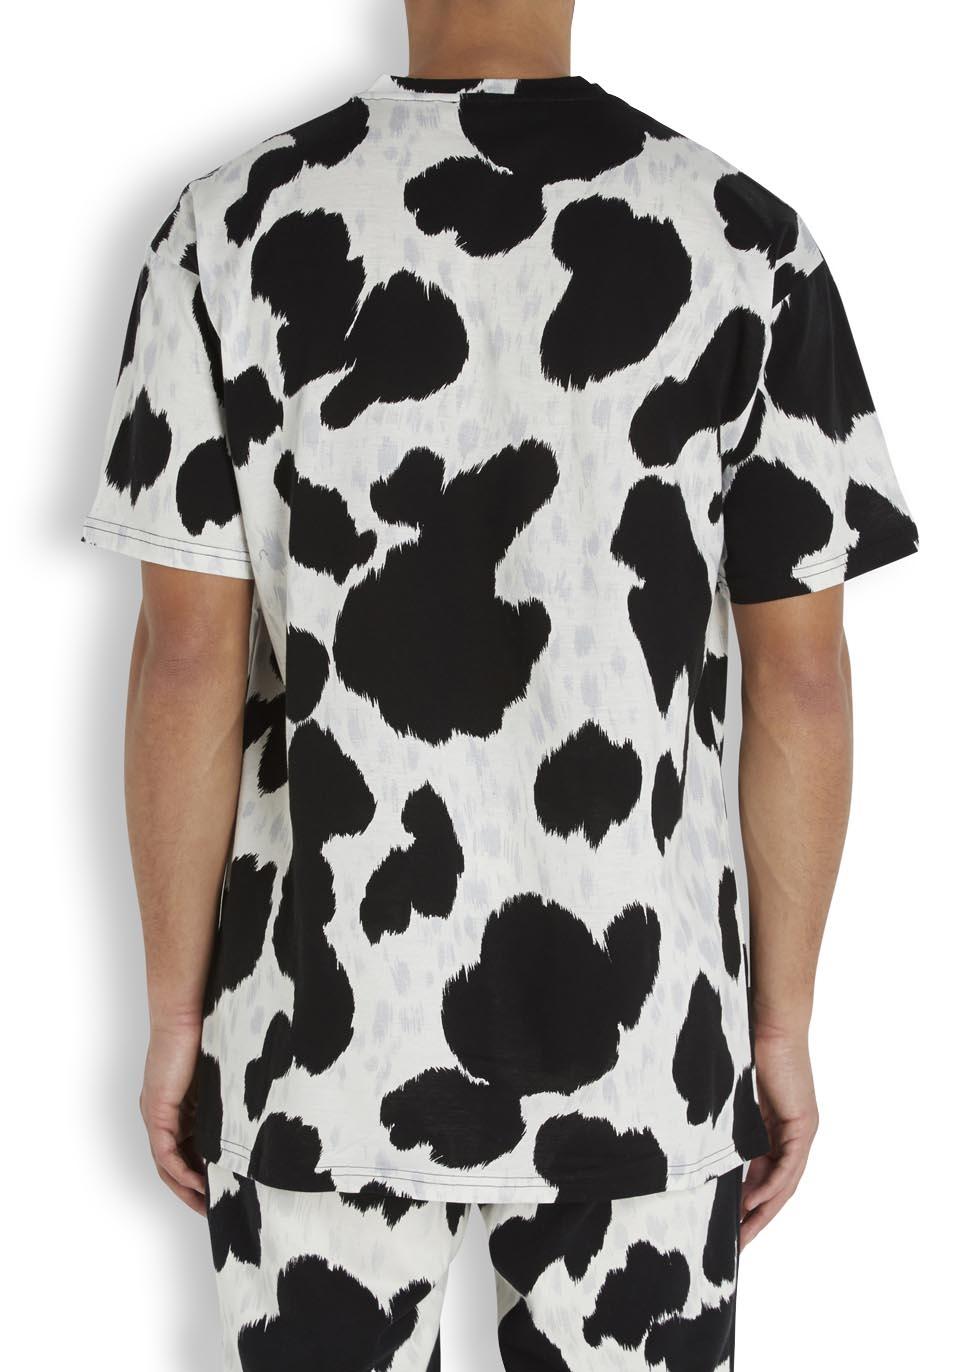 Cow Print Shirt Agcrewall